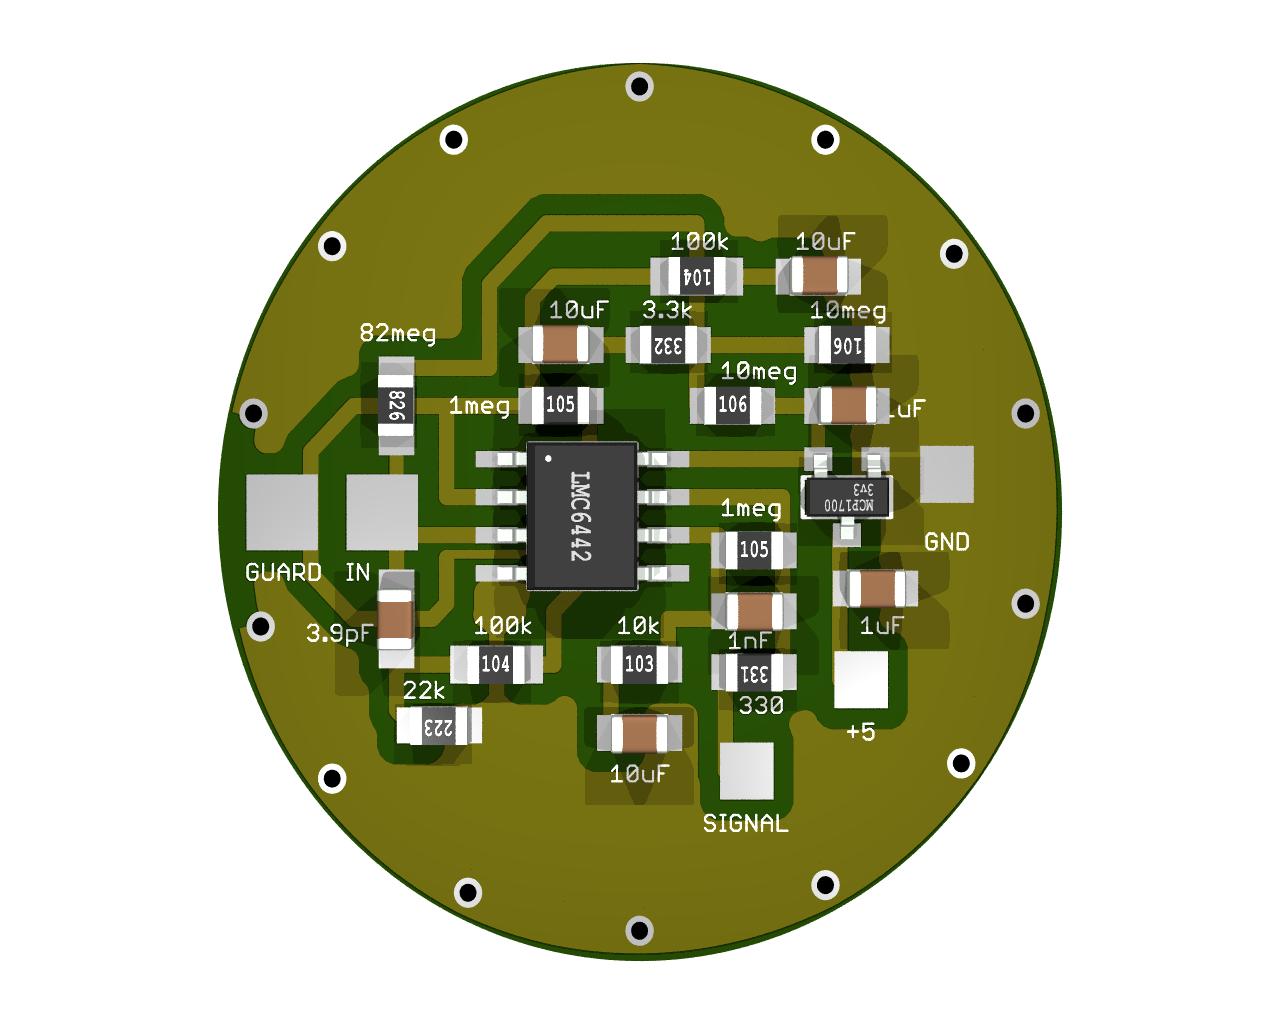 Biometrics Theremino Arduino Ecg Ekg Heart Rate Monitor Circuit Prototype Youtube This